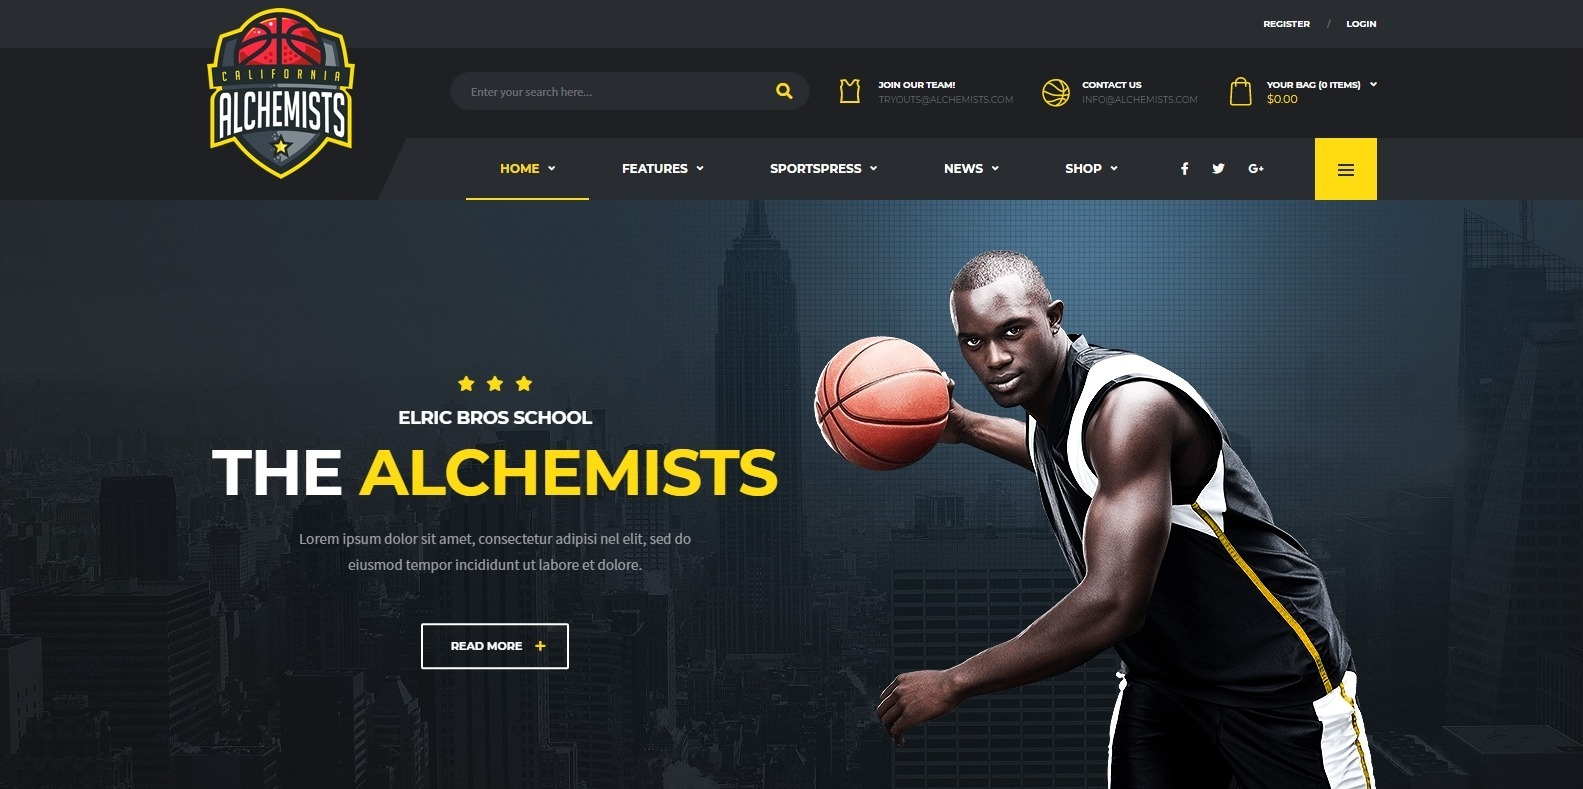 alchemist-softball-website-template-wordpress